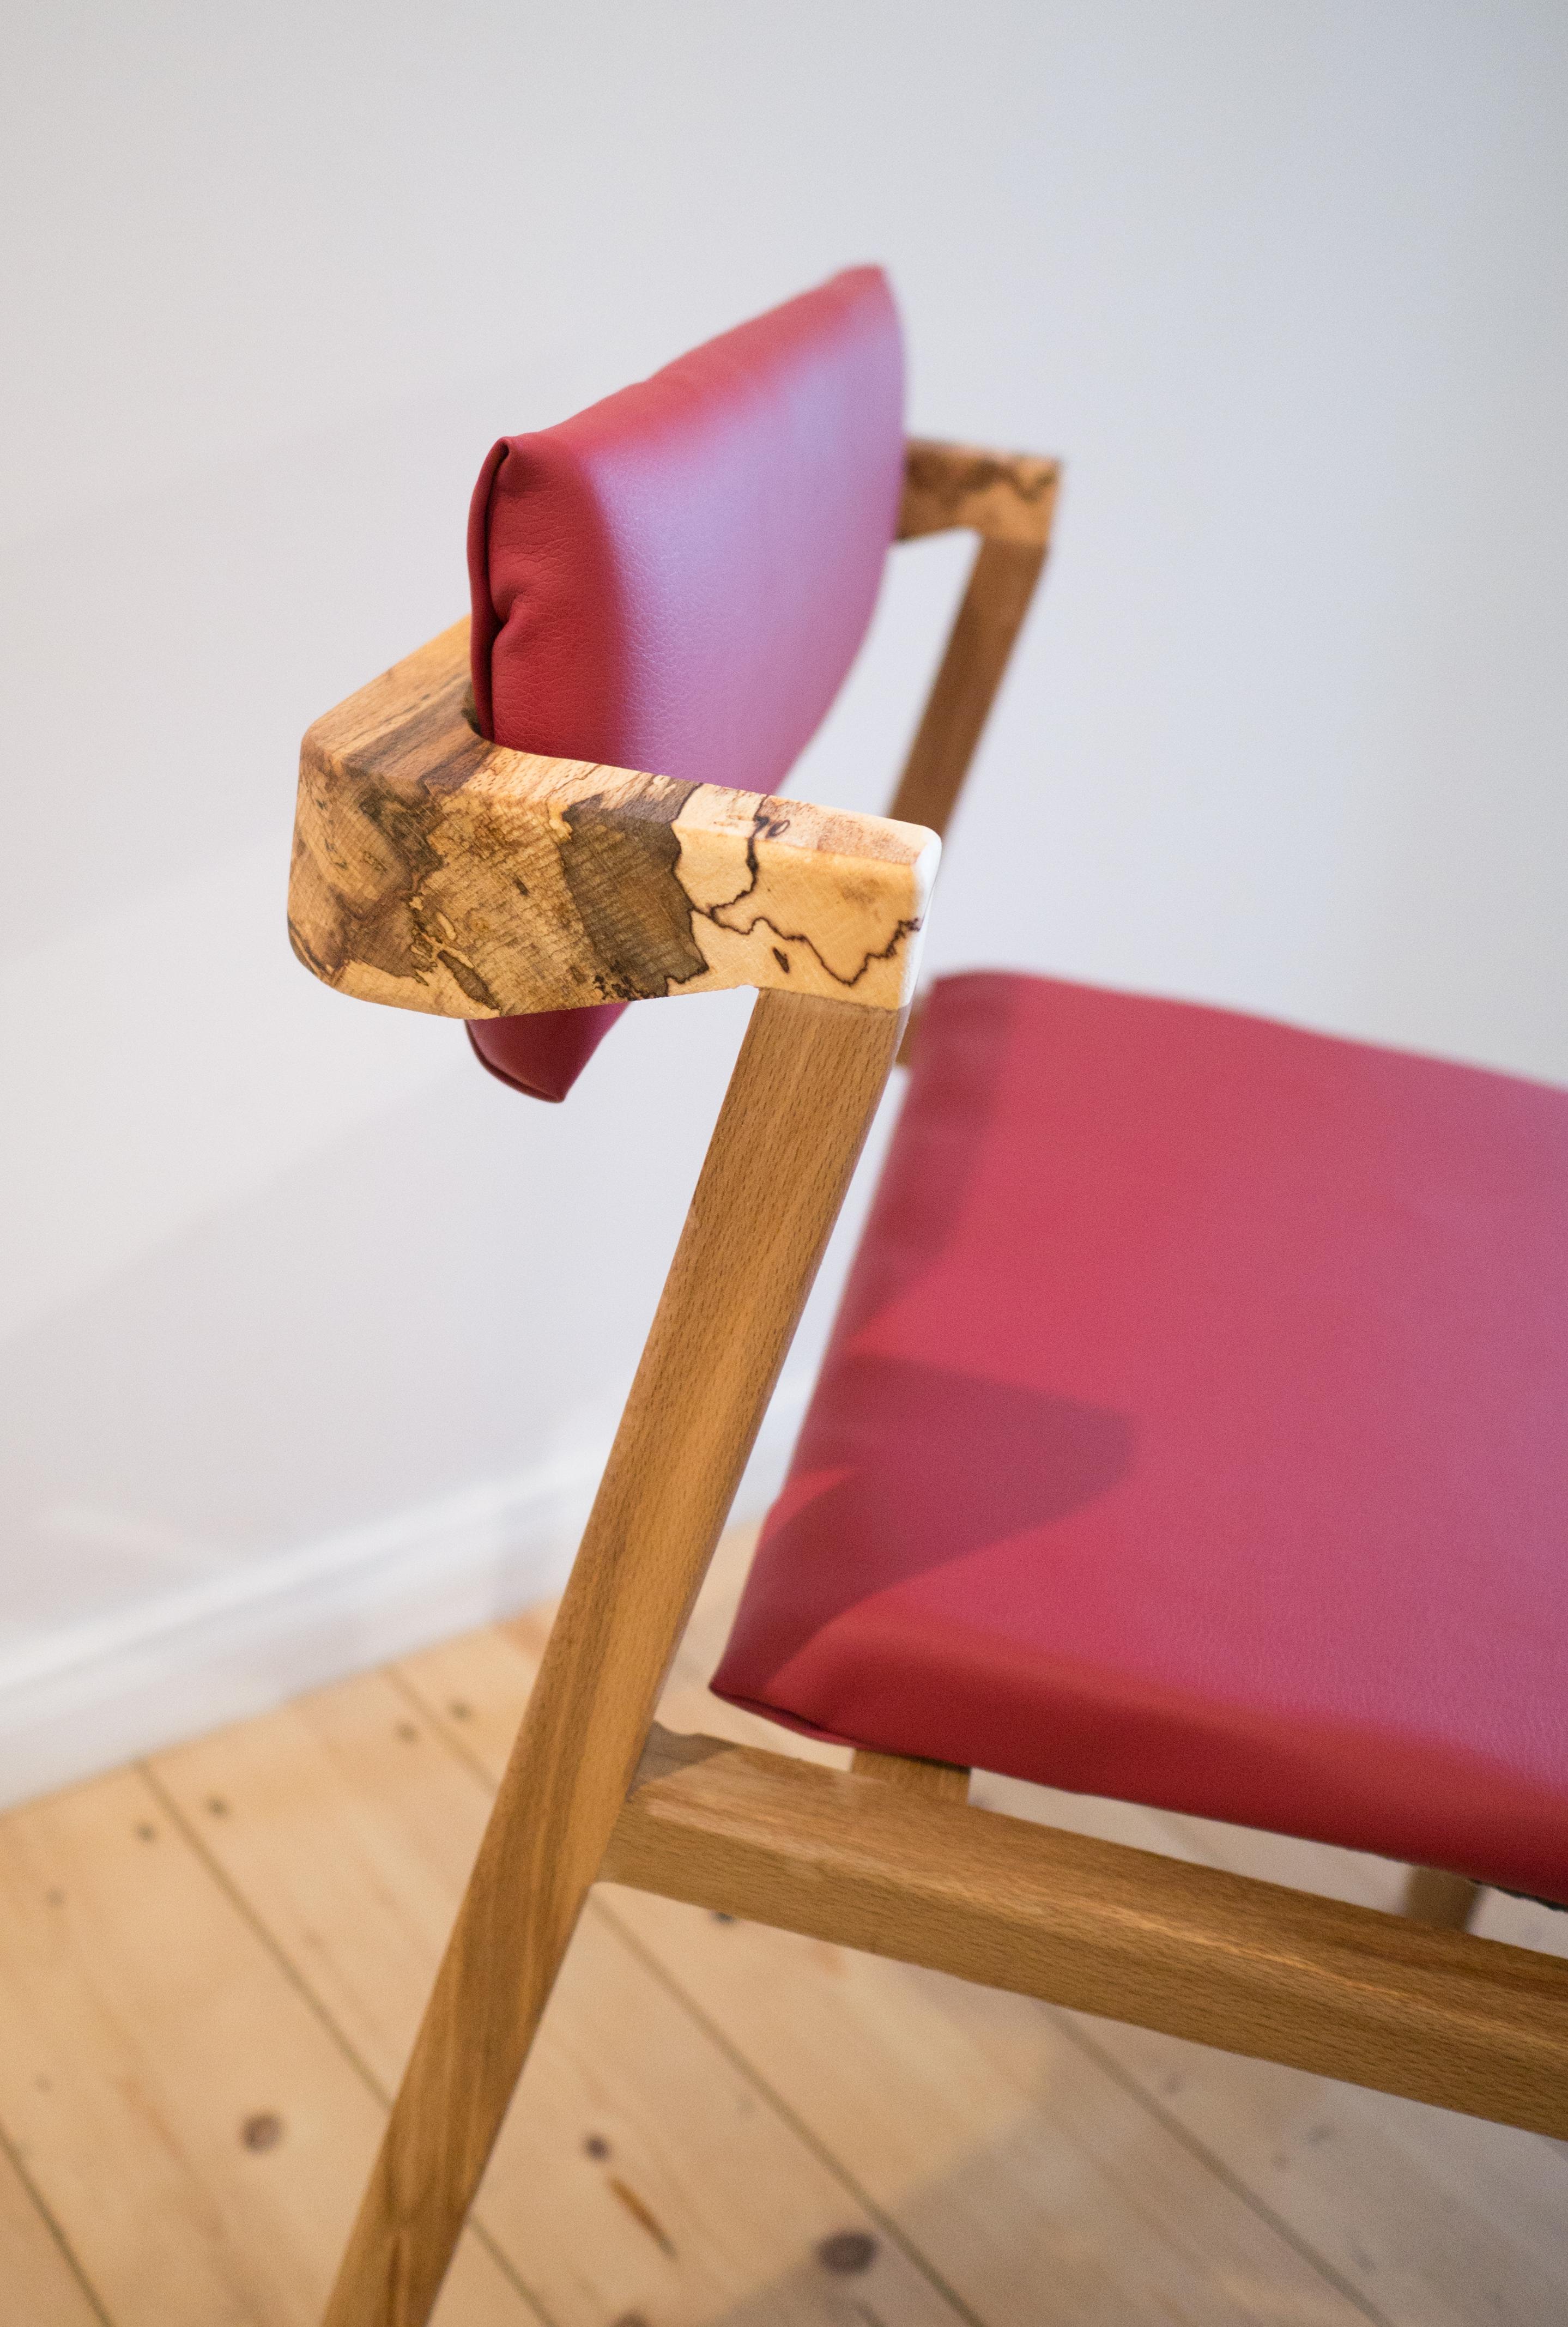 Maru Nachhaltige Möbel - Öko Design Stuhl aus Holz